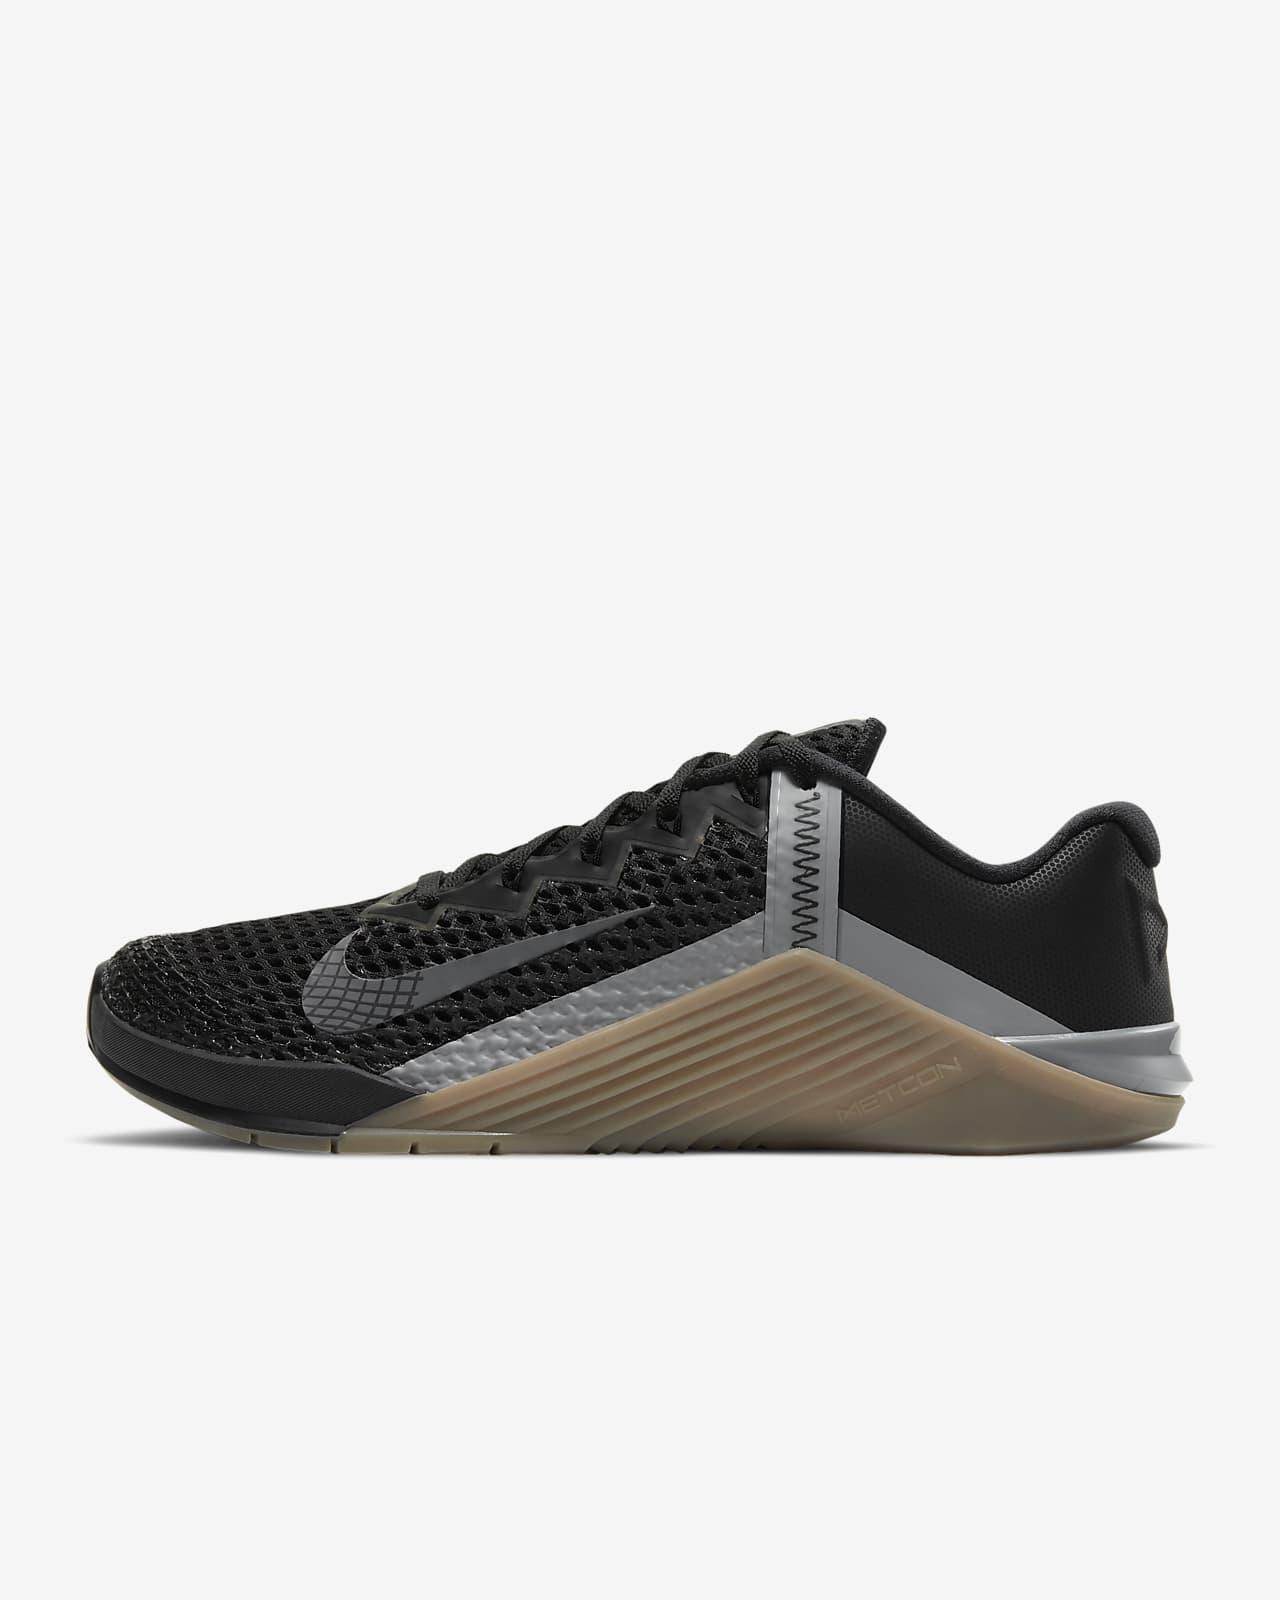 Nike Metcon 6 Men's Training Shoe